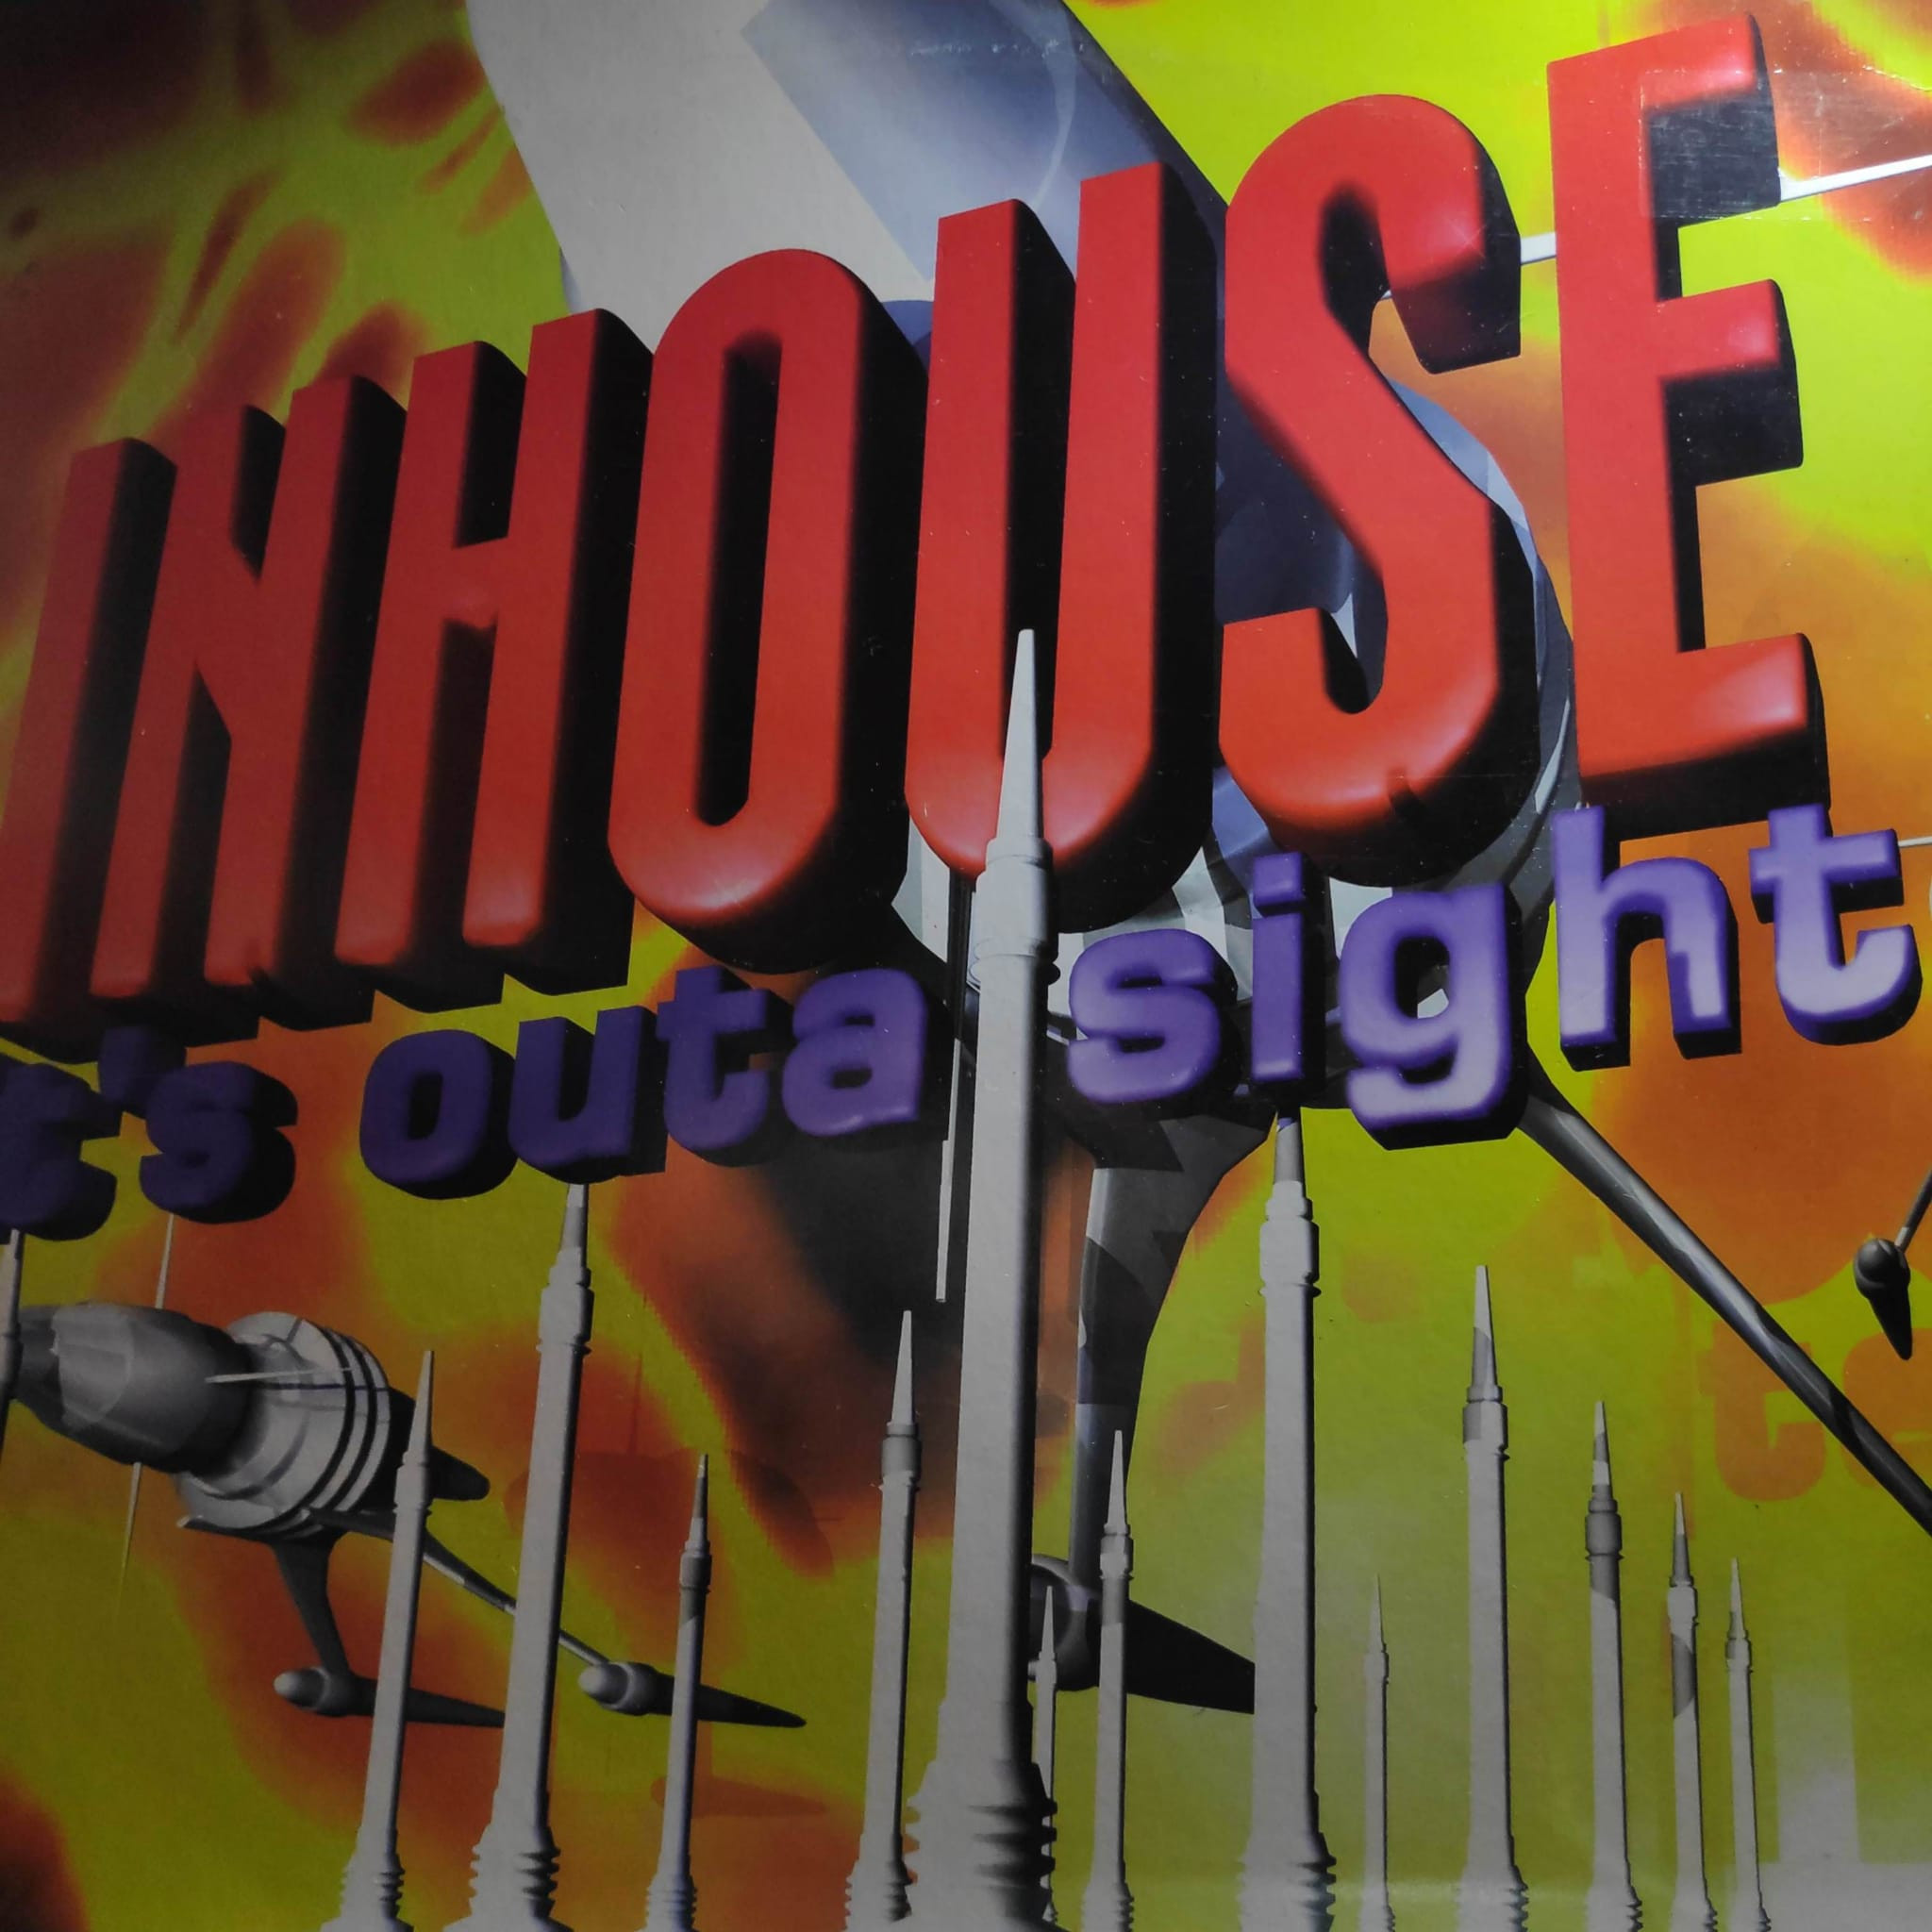 (23780) Inhouse – It's Outa Sight